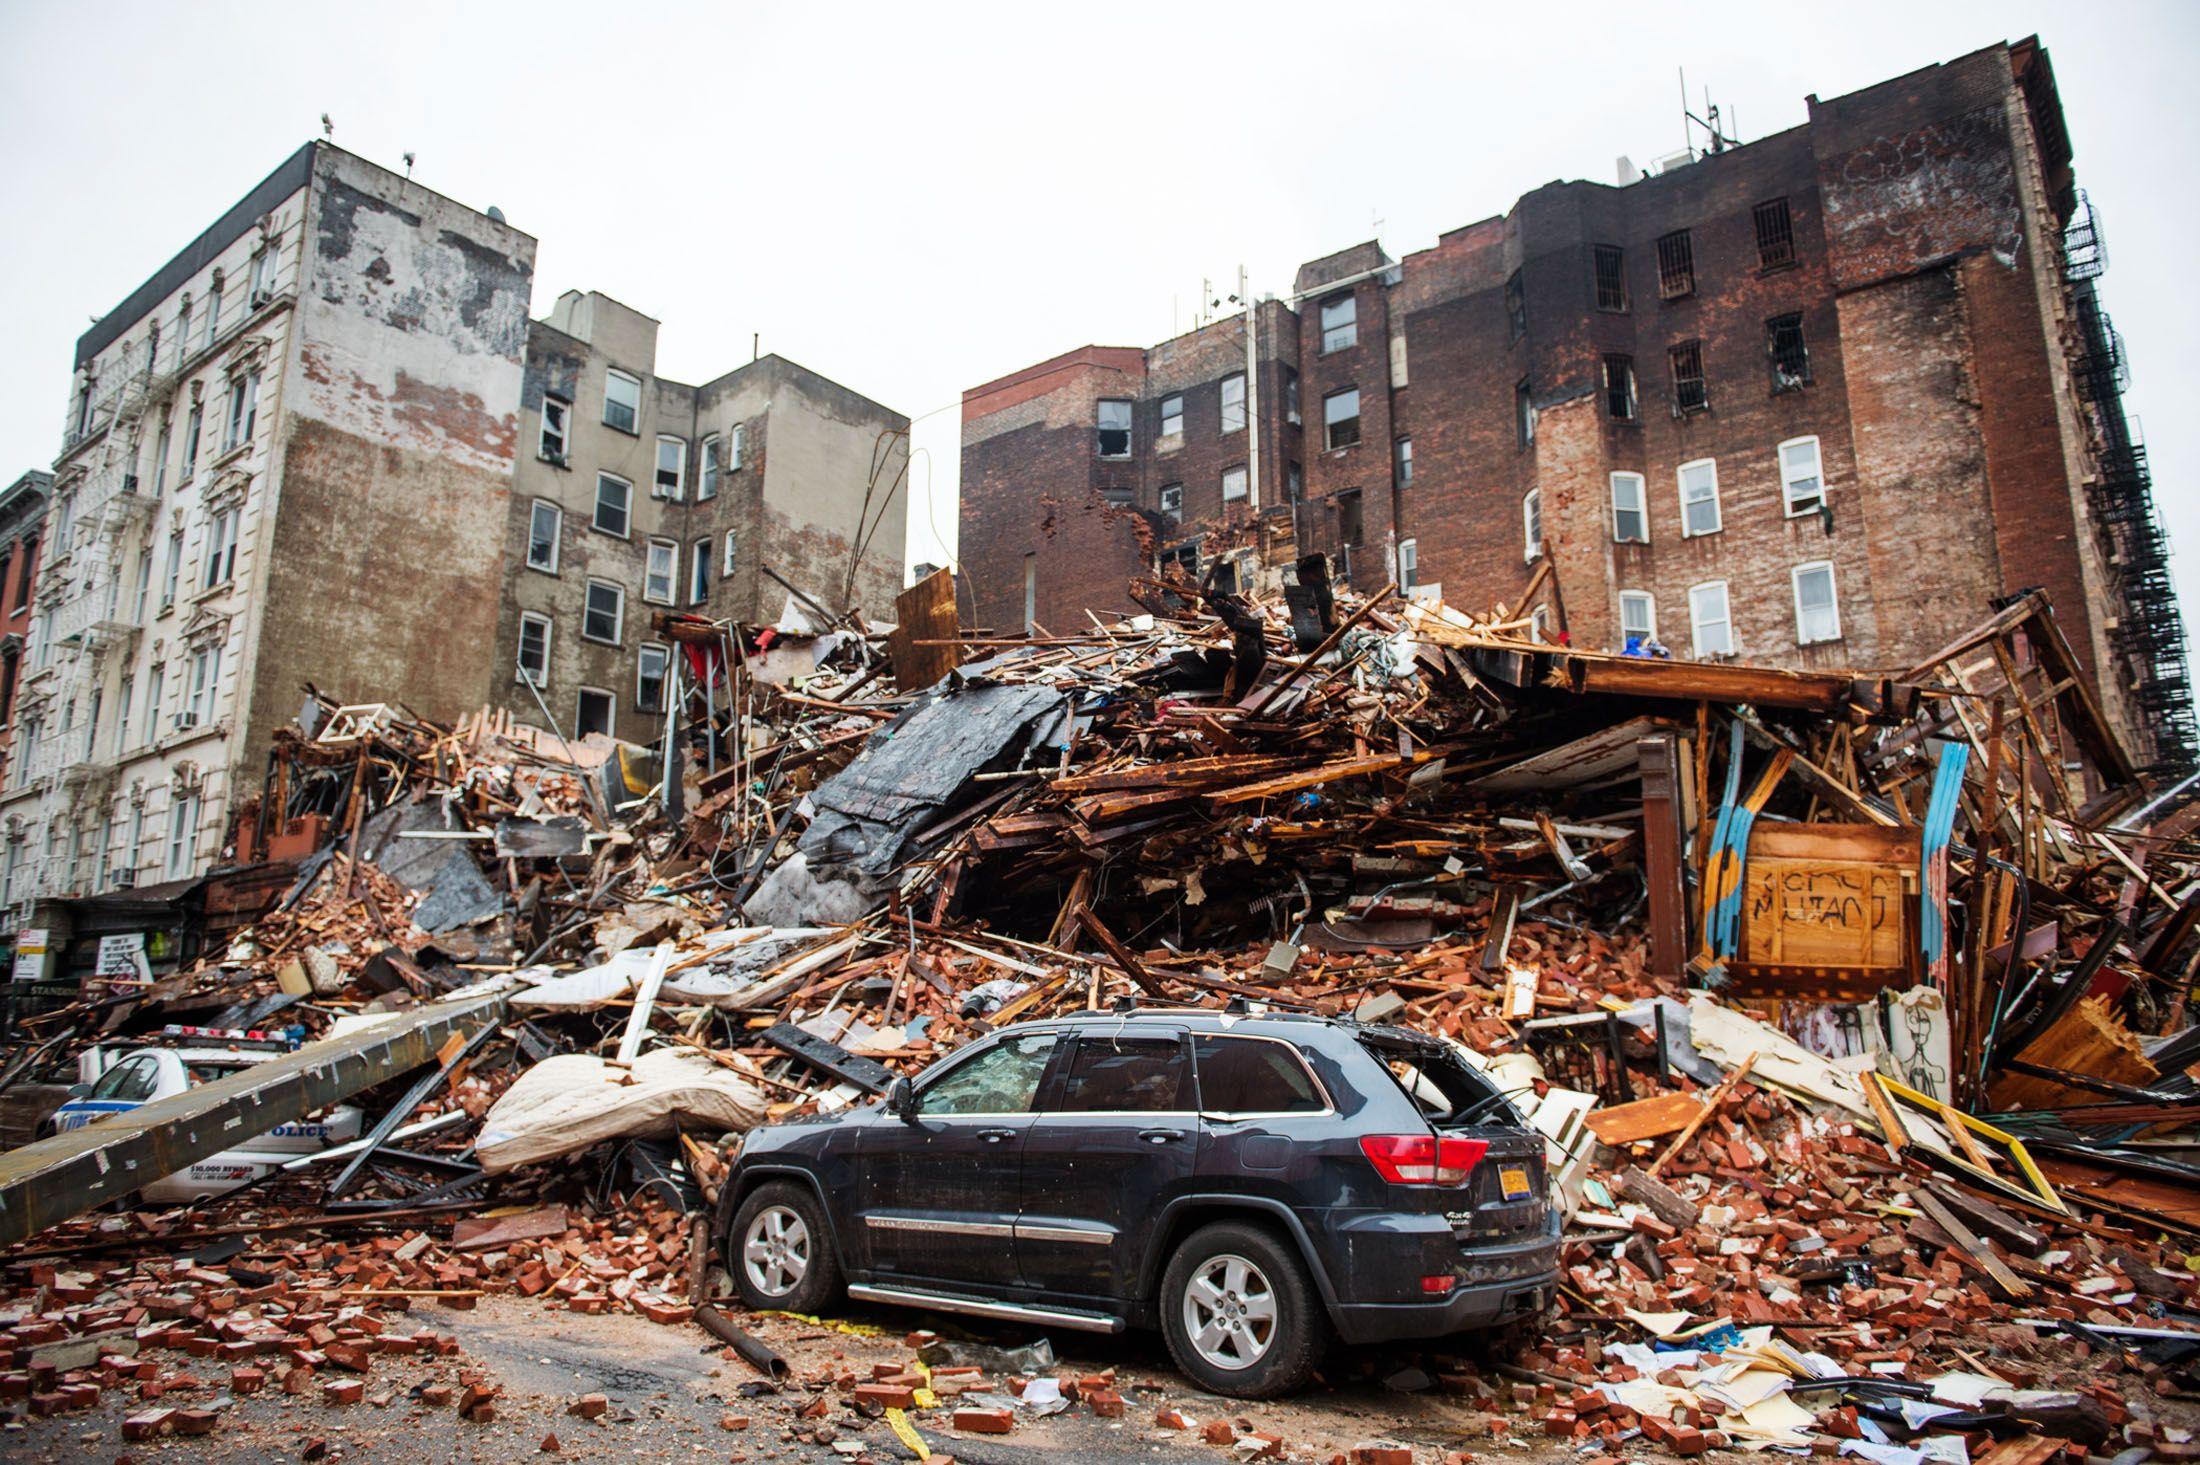 Who Do You Sue When Your Building Explodes?